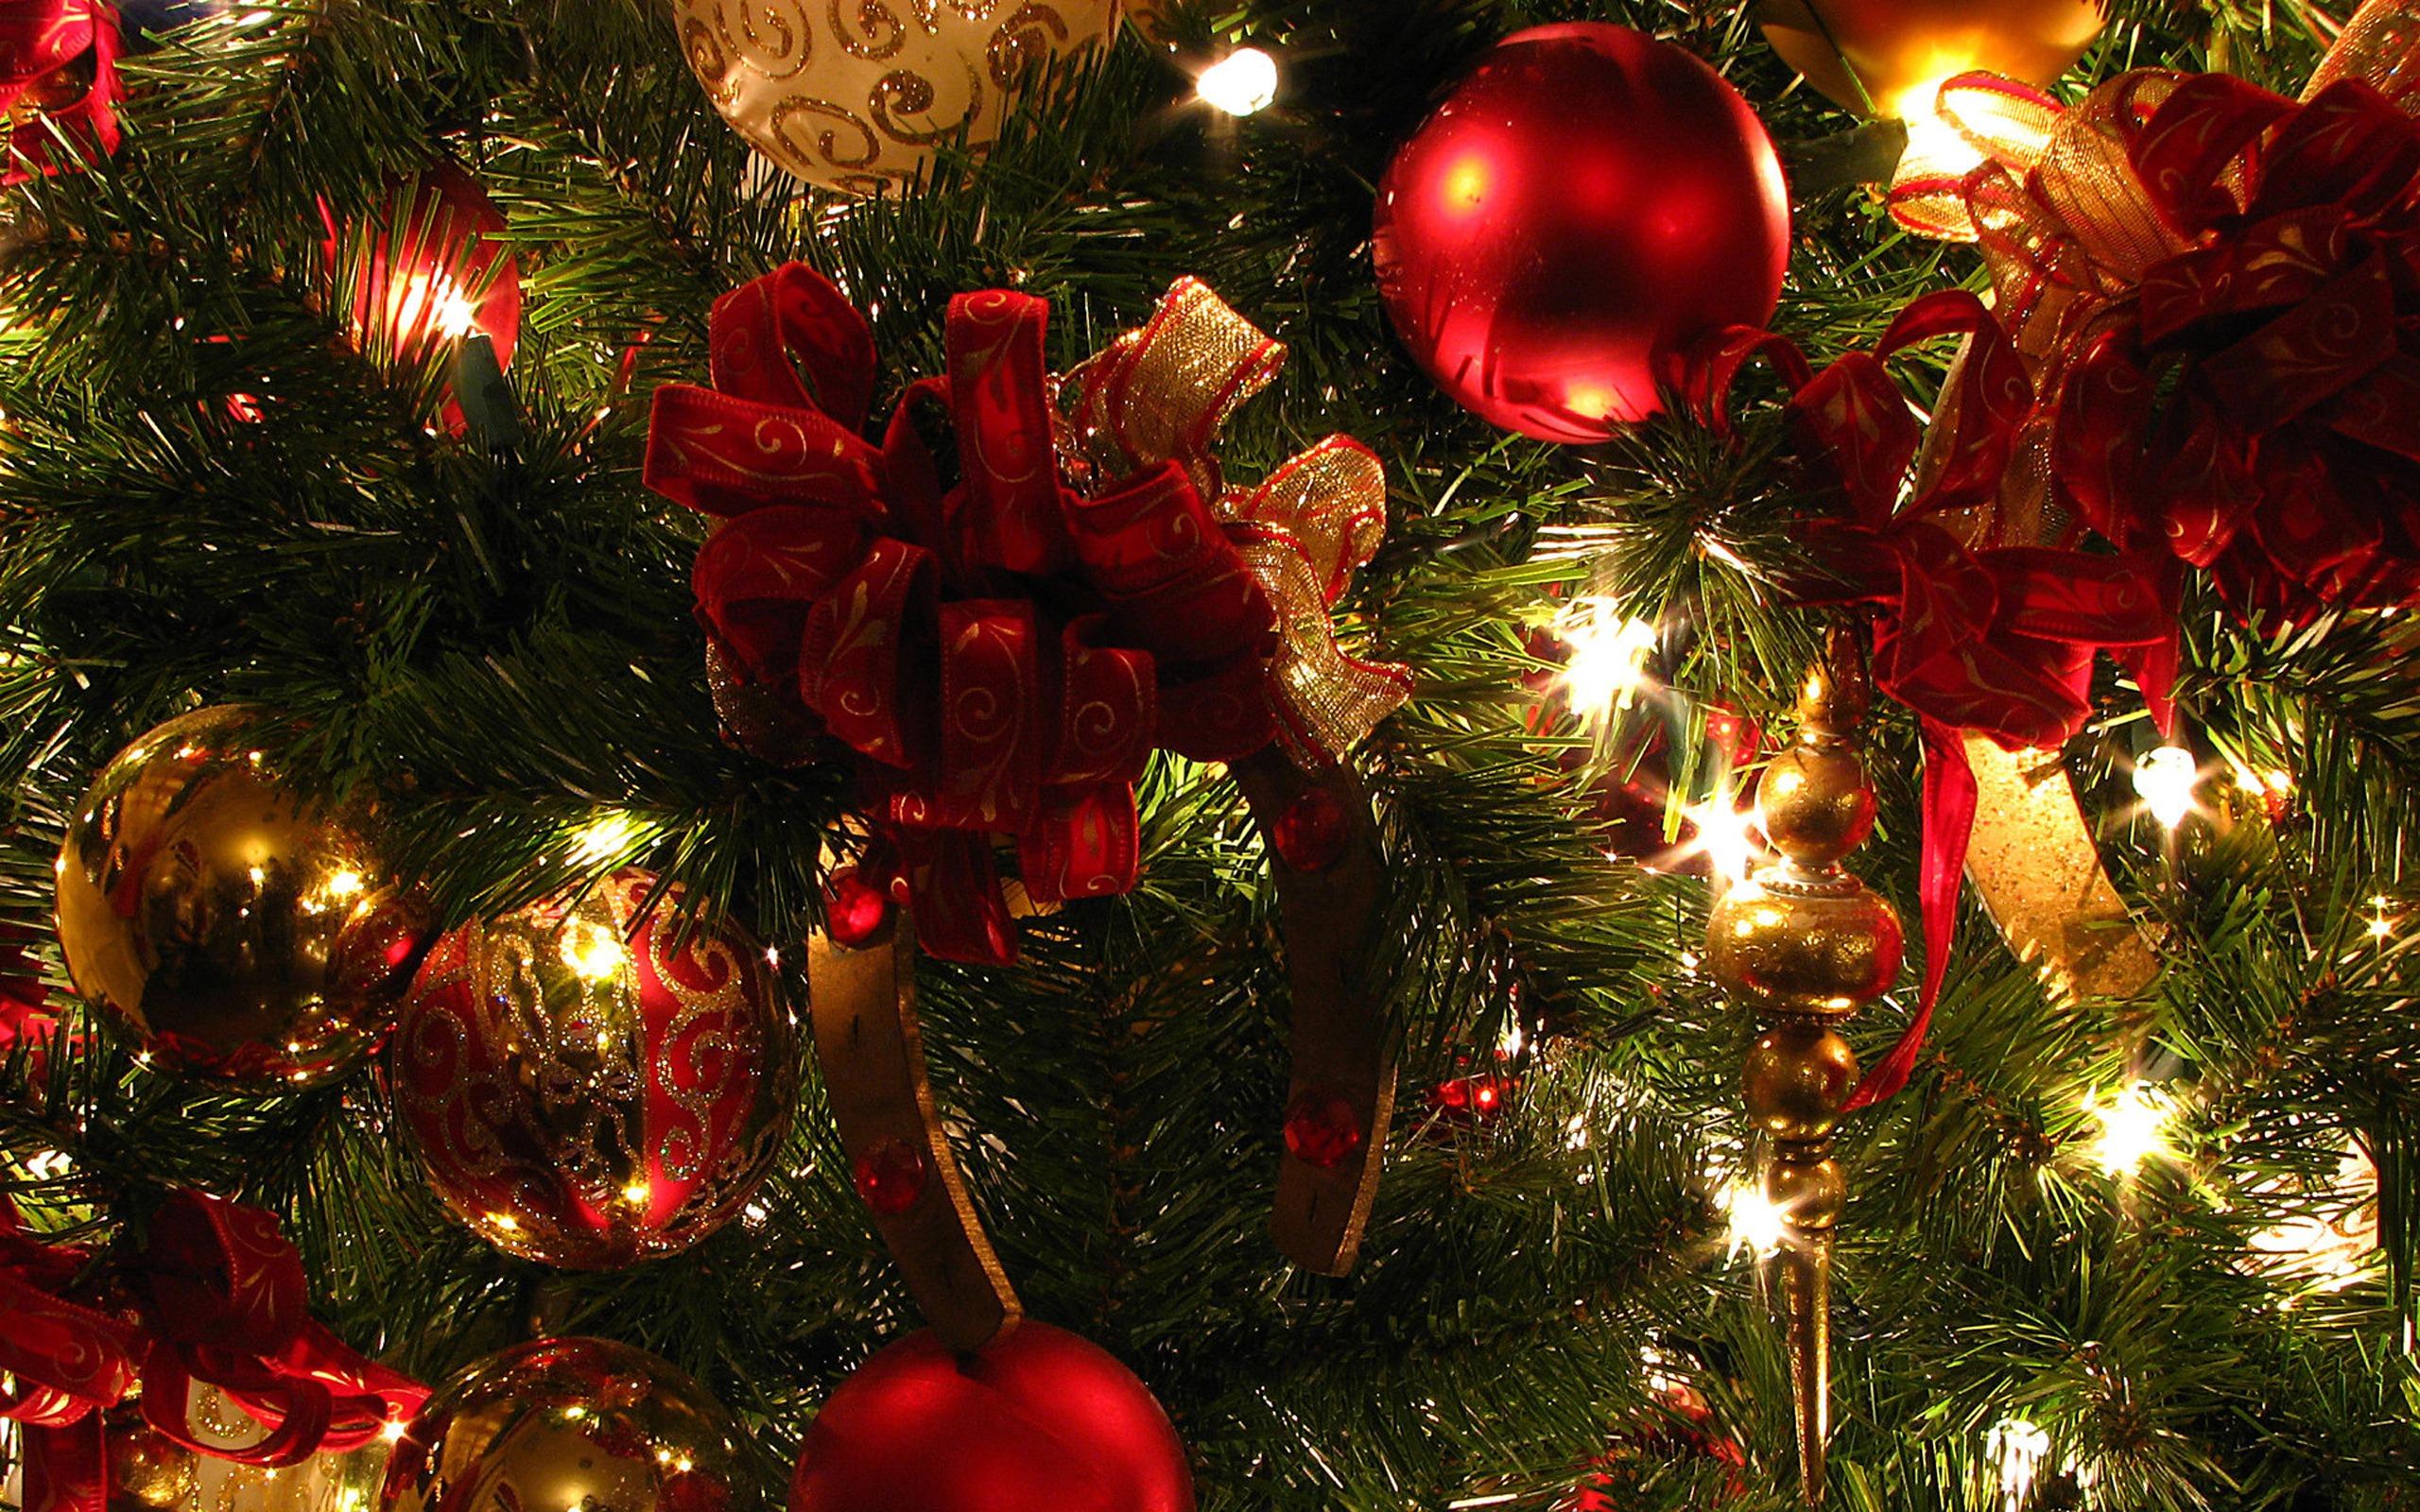 44 Christmas Decorations Hd Wallpapers On Wallpapersafari